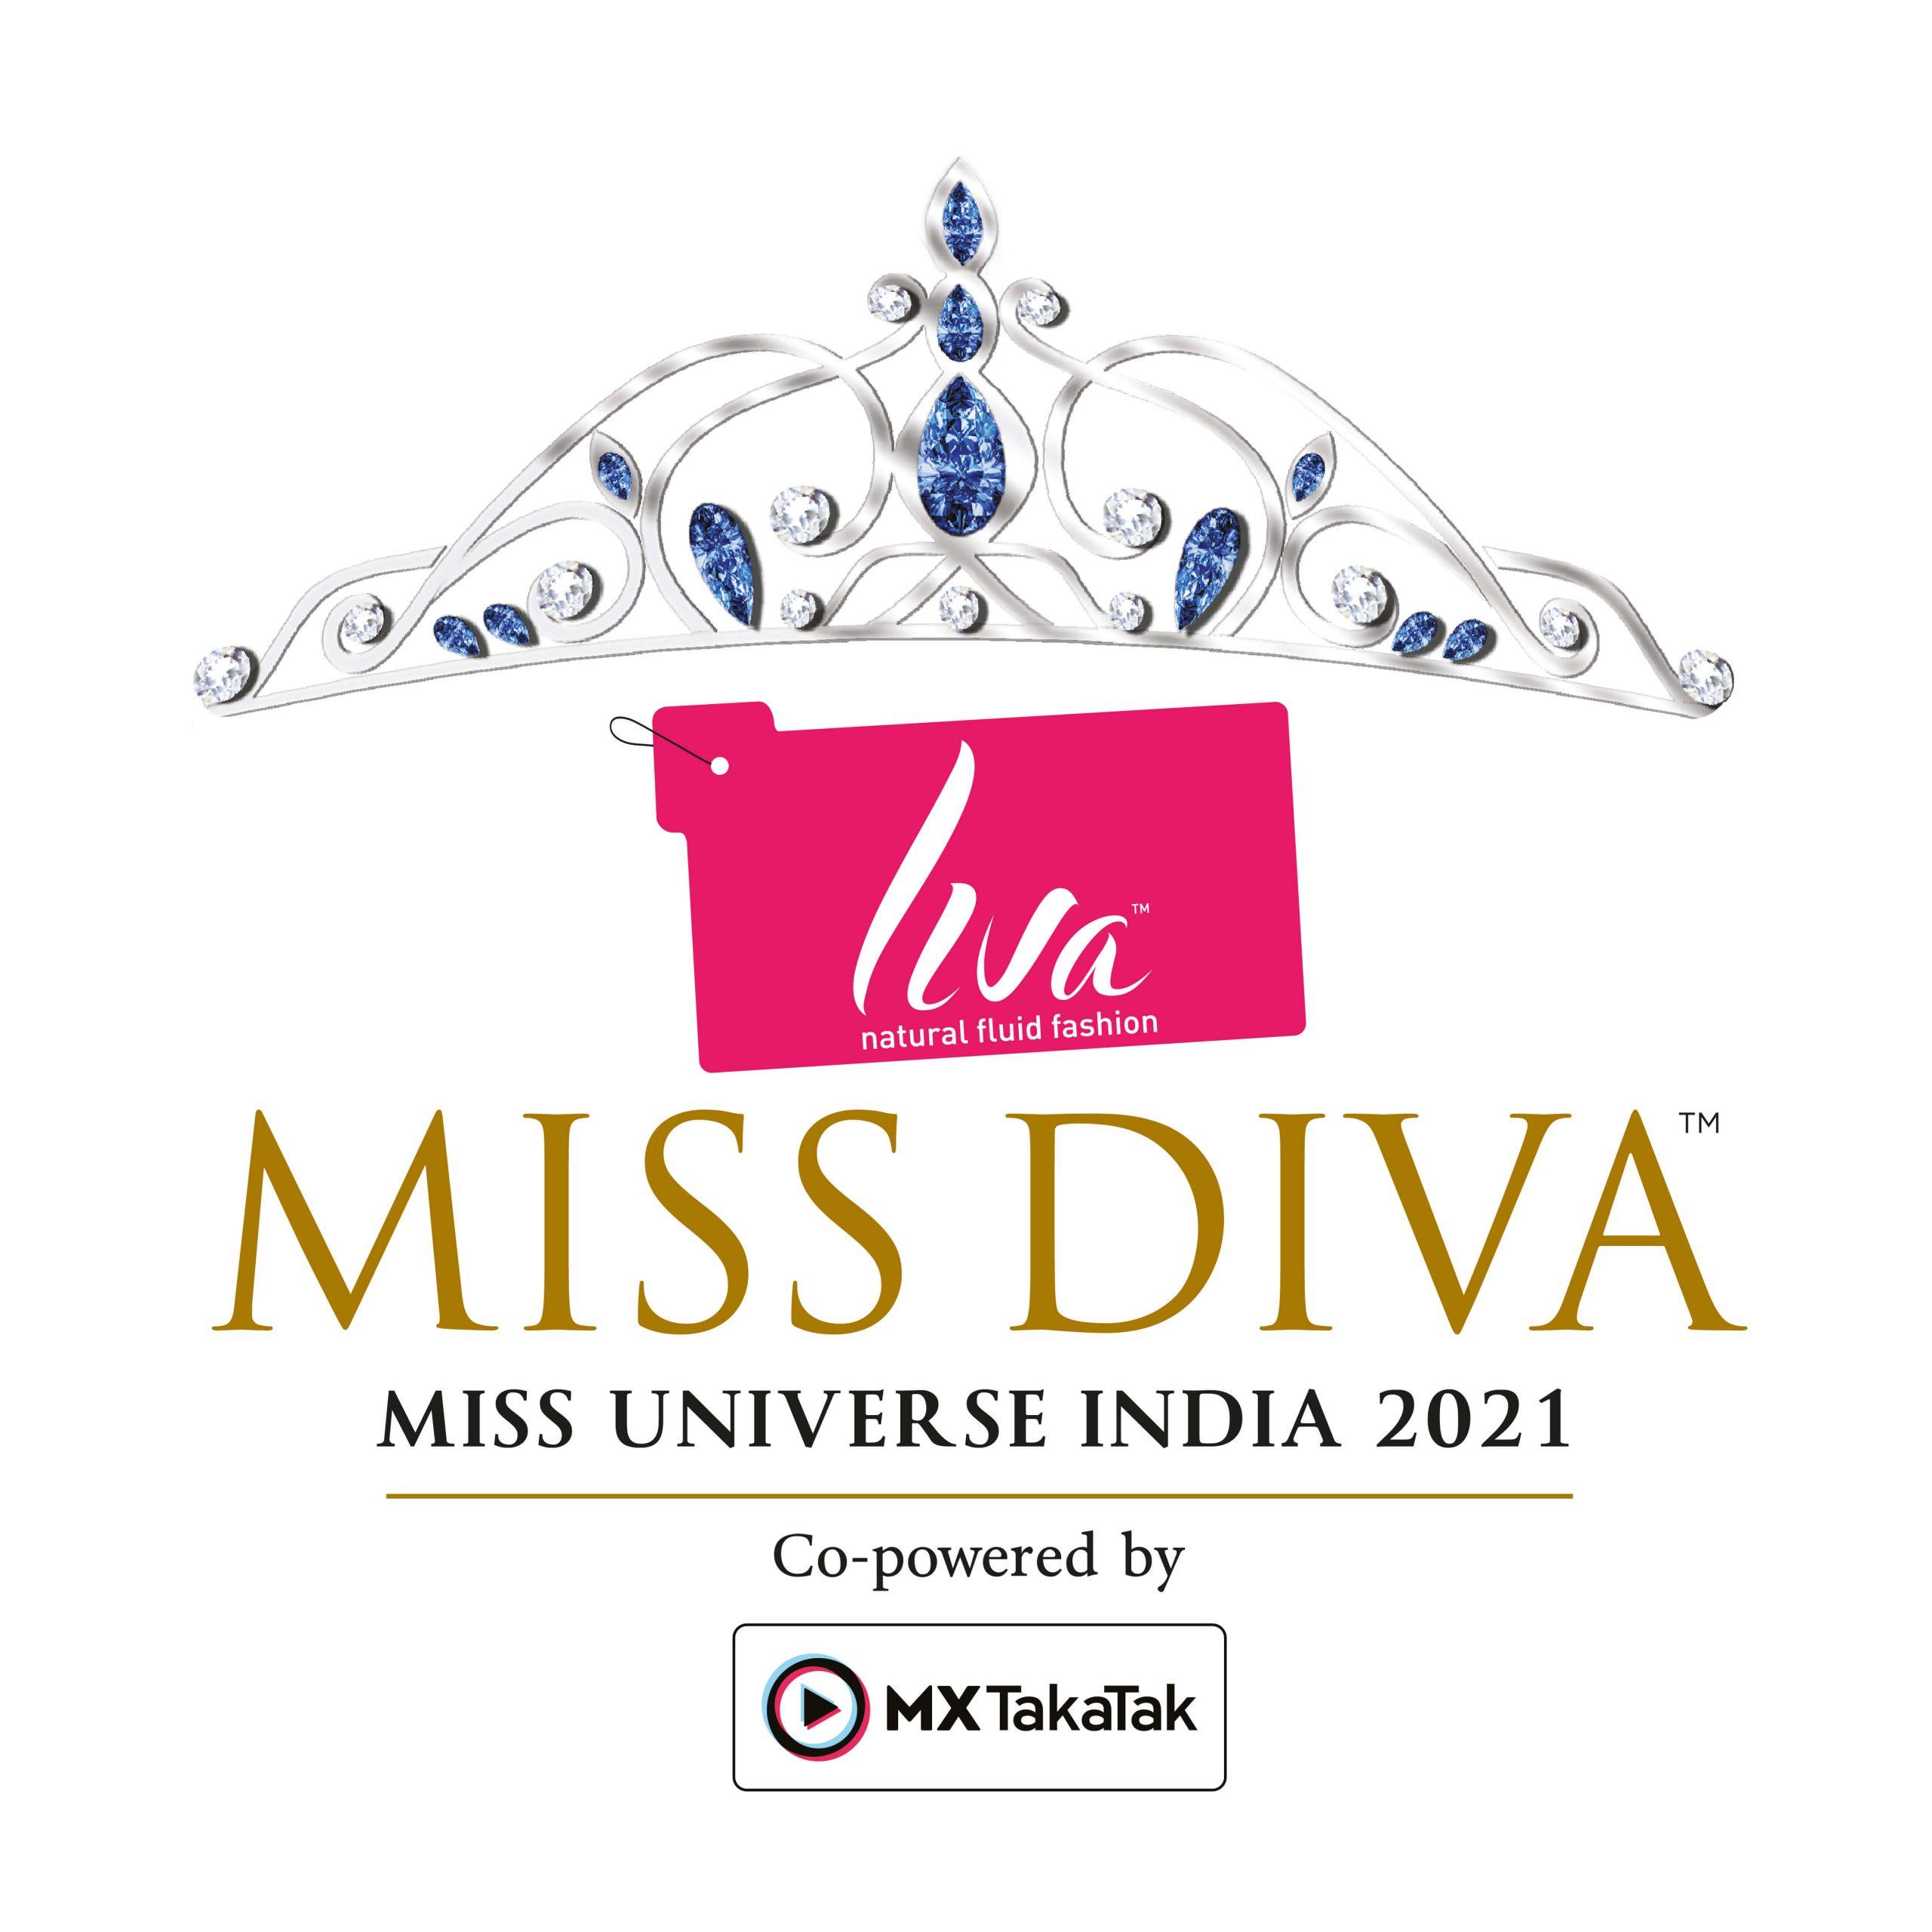 Miss Diva 2021